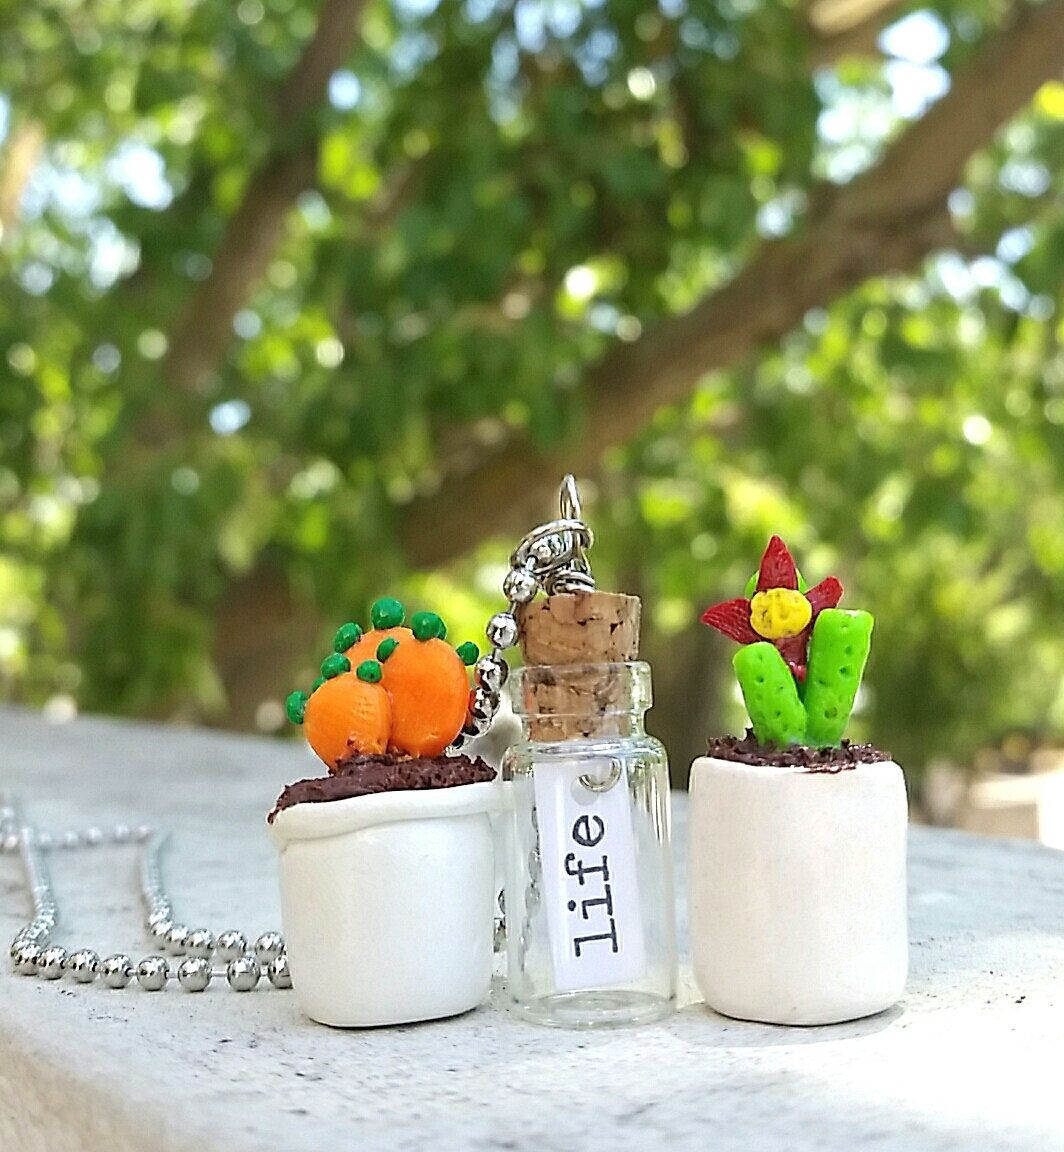 cactus plant necklace,message in a bottle necklace, polymer clay, miniature plant, unique necklace, unique charms, unique pendants, charms by Cthruglass on Etsy